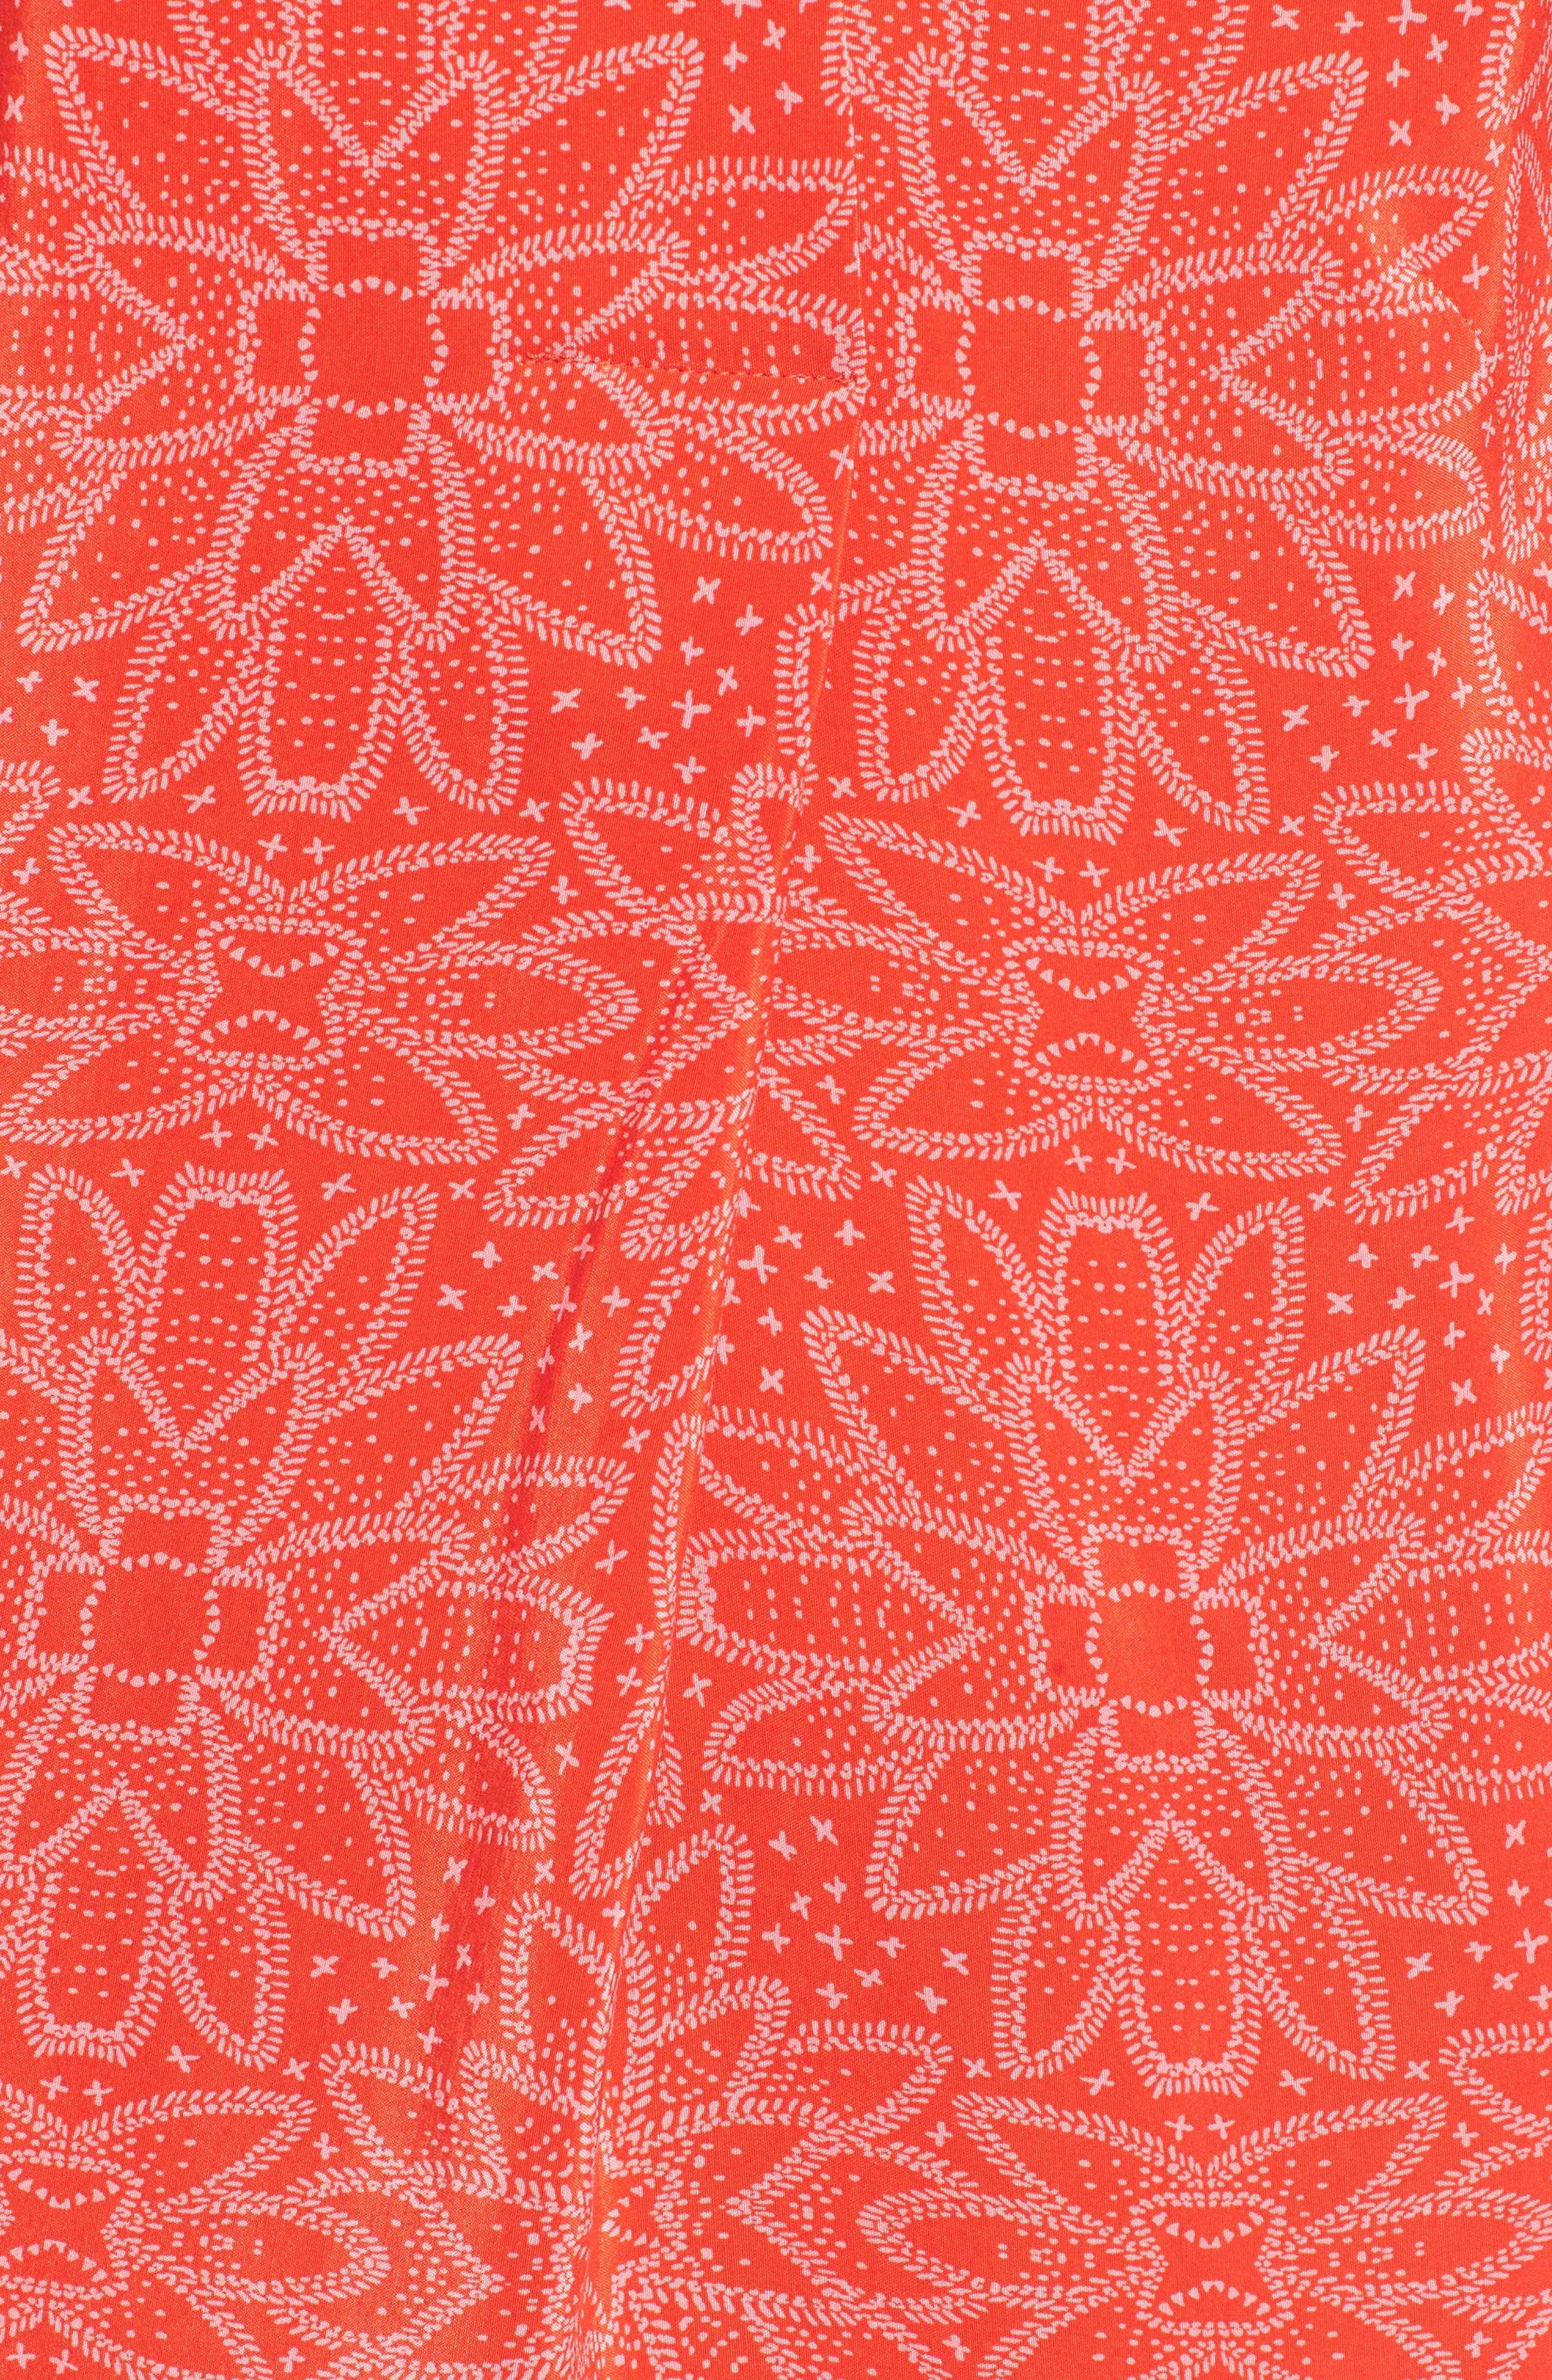 Luna Riya Print Dress,                             Alternate thumbnail 5, color,                             RED/ MULTI